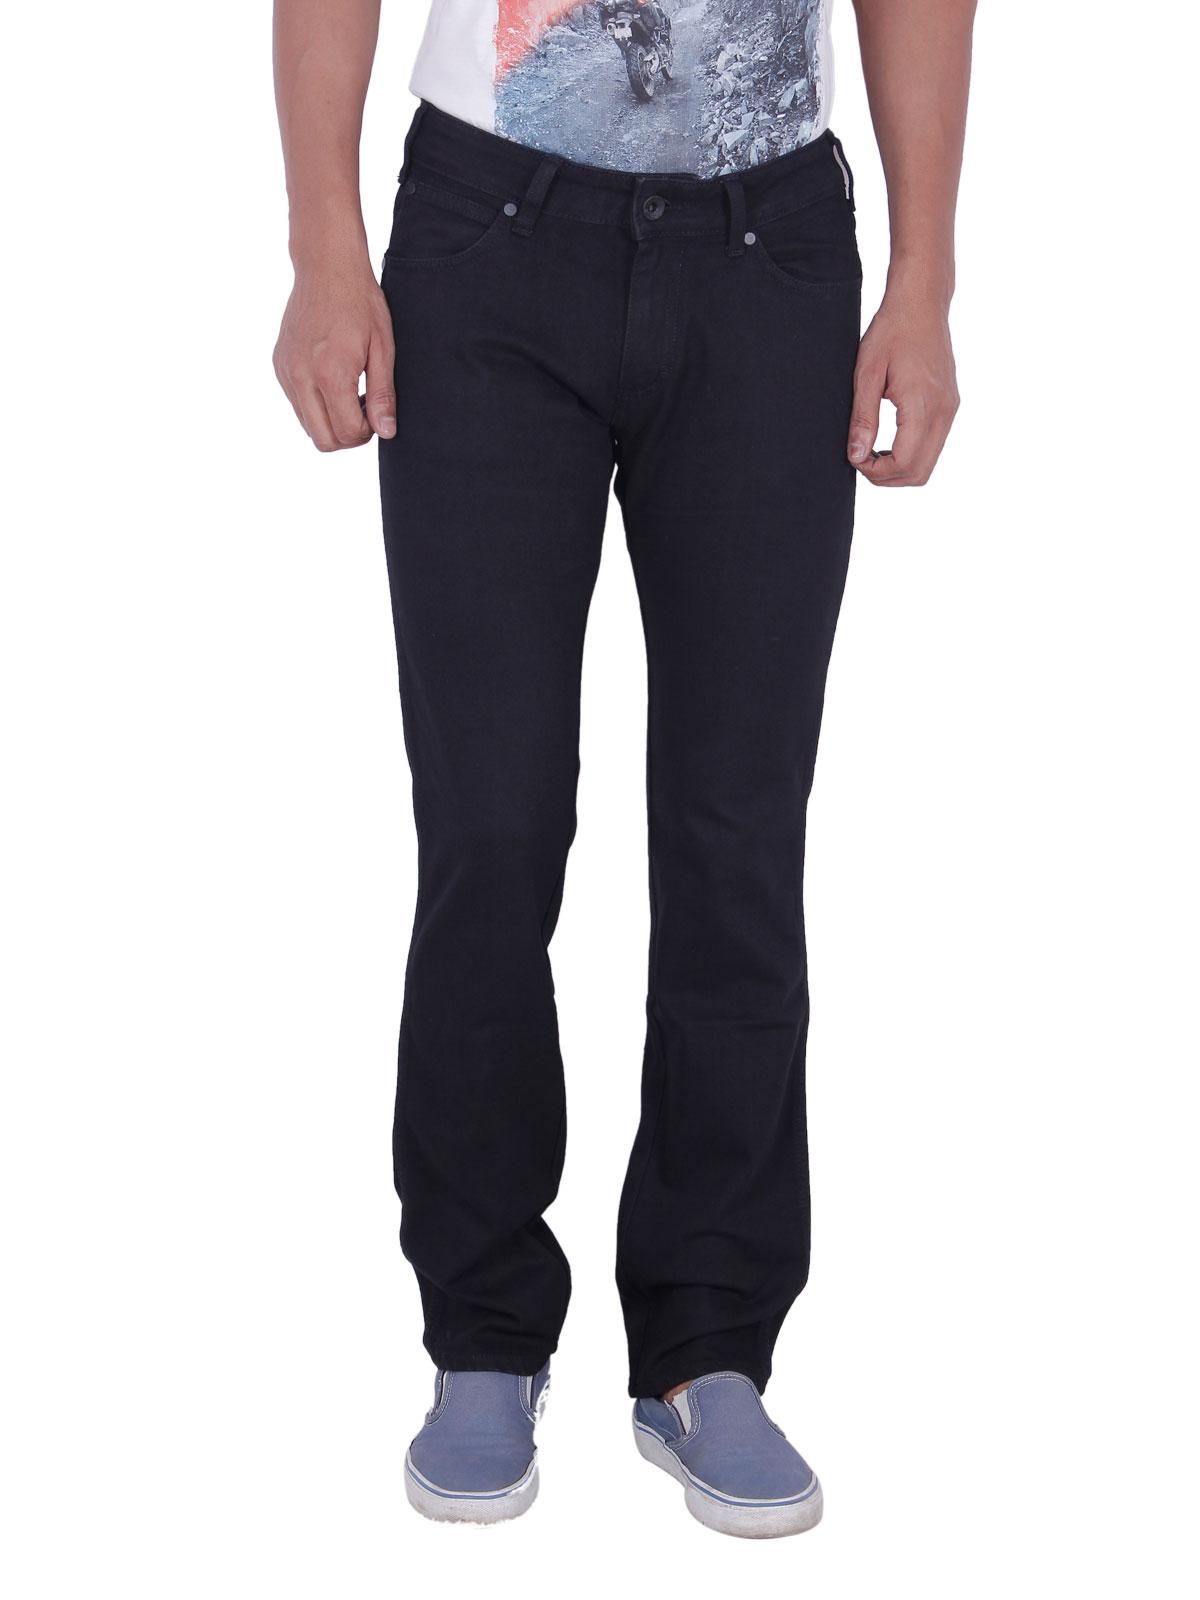 Wrangler Black Skanders Slim Fit Jeans For Men